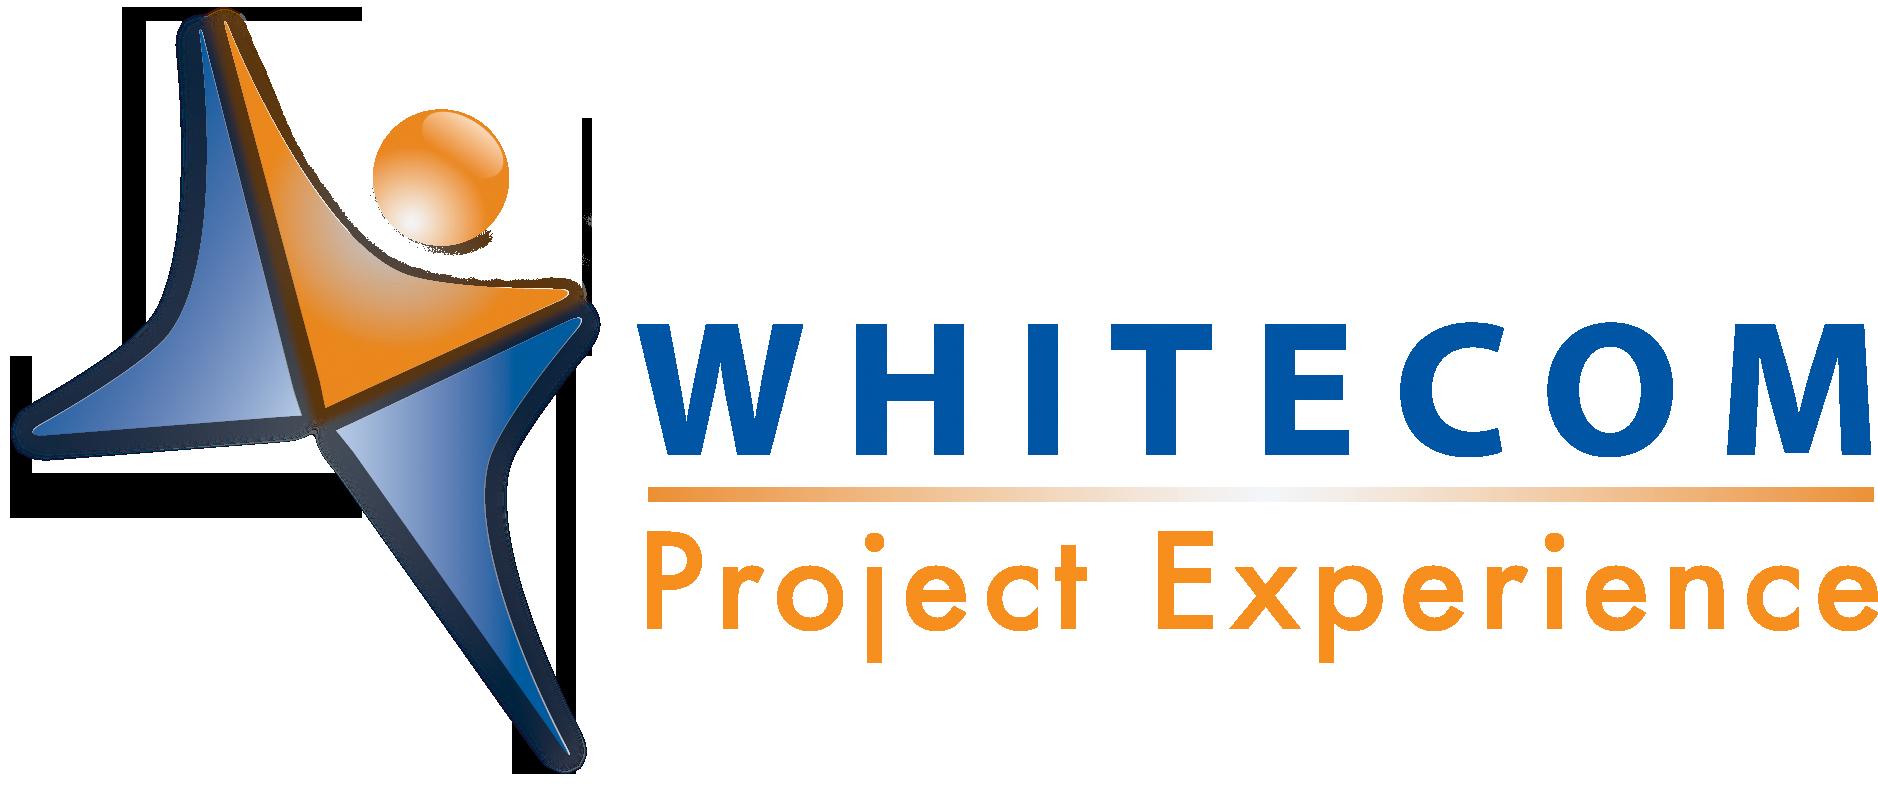 Whitecom